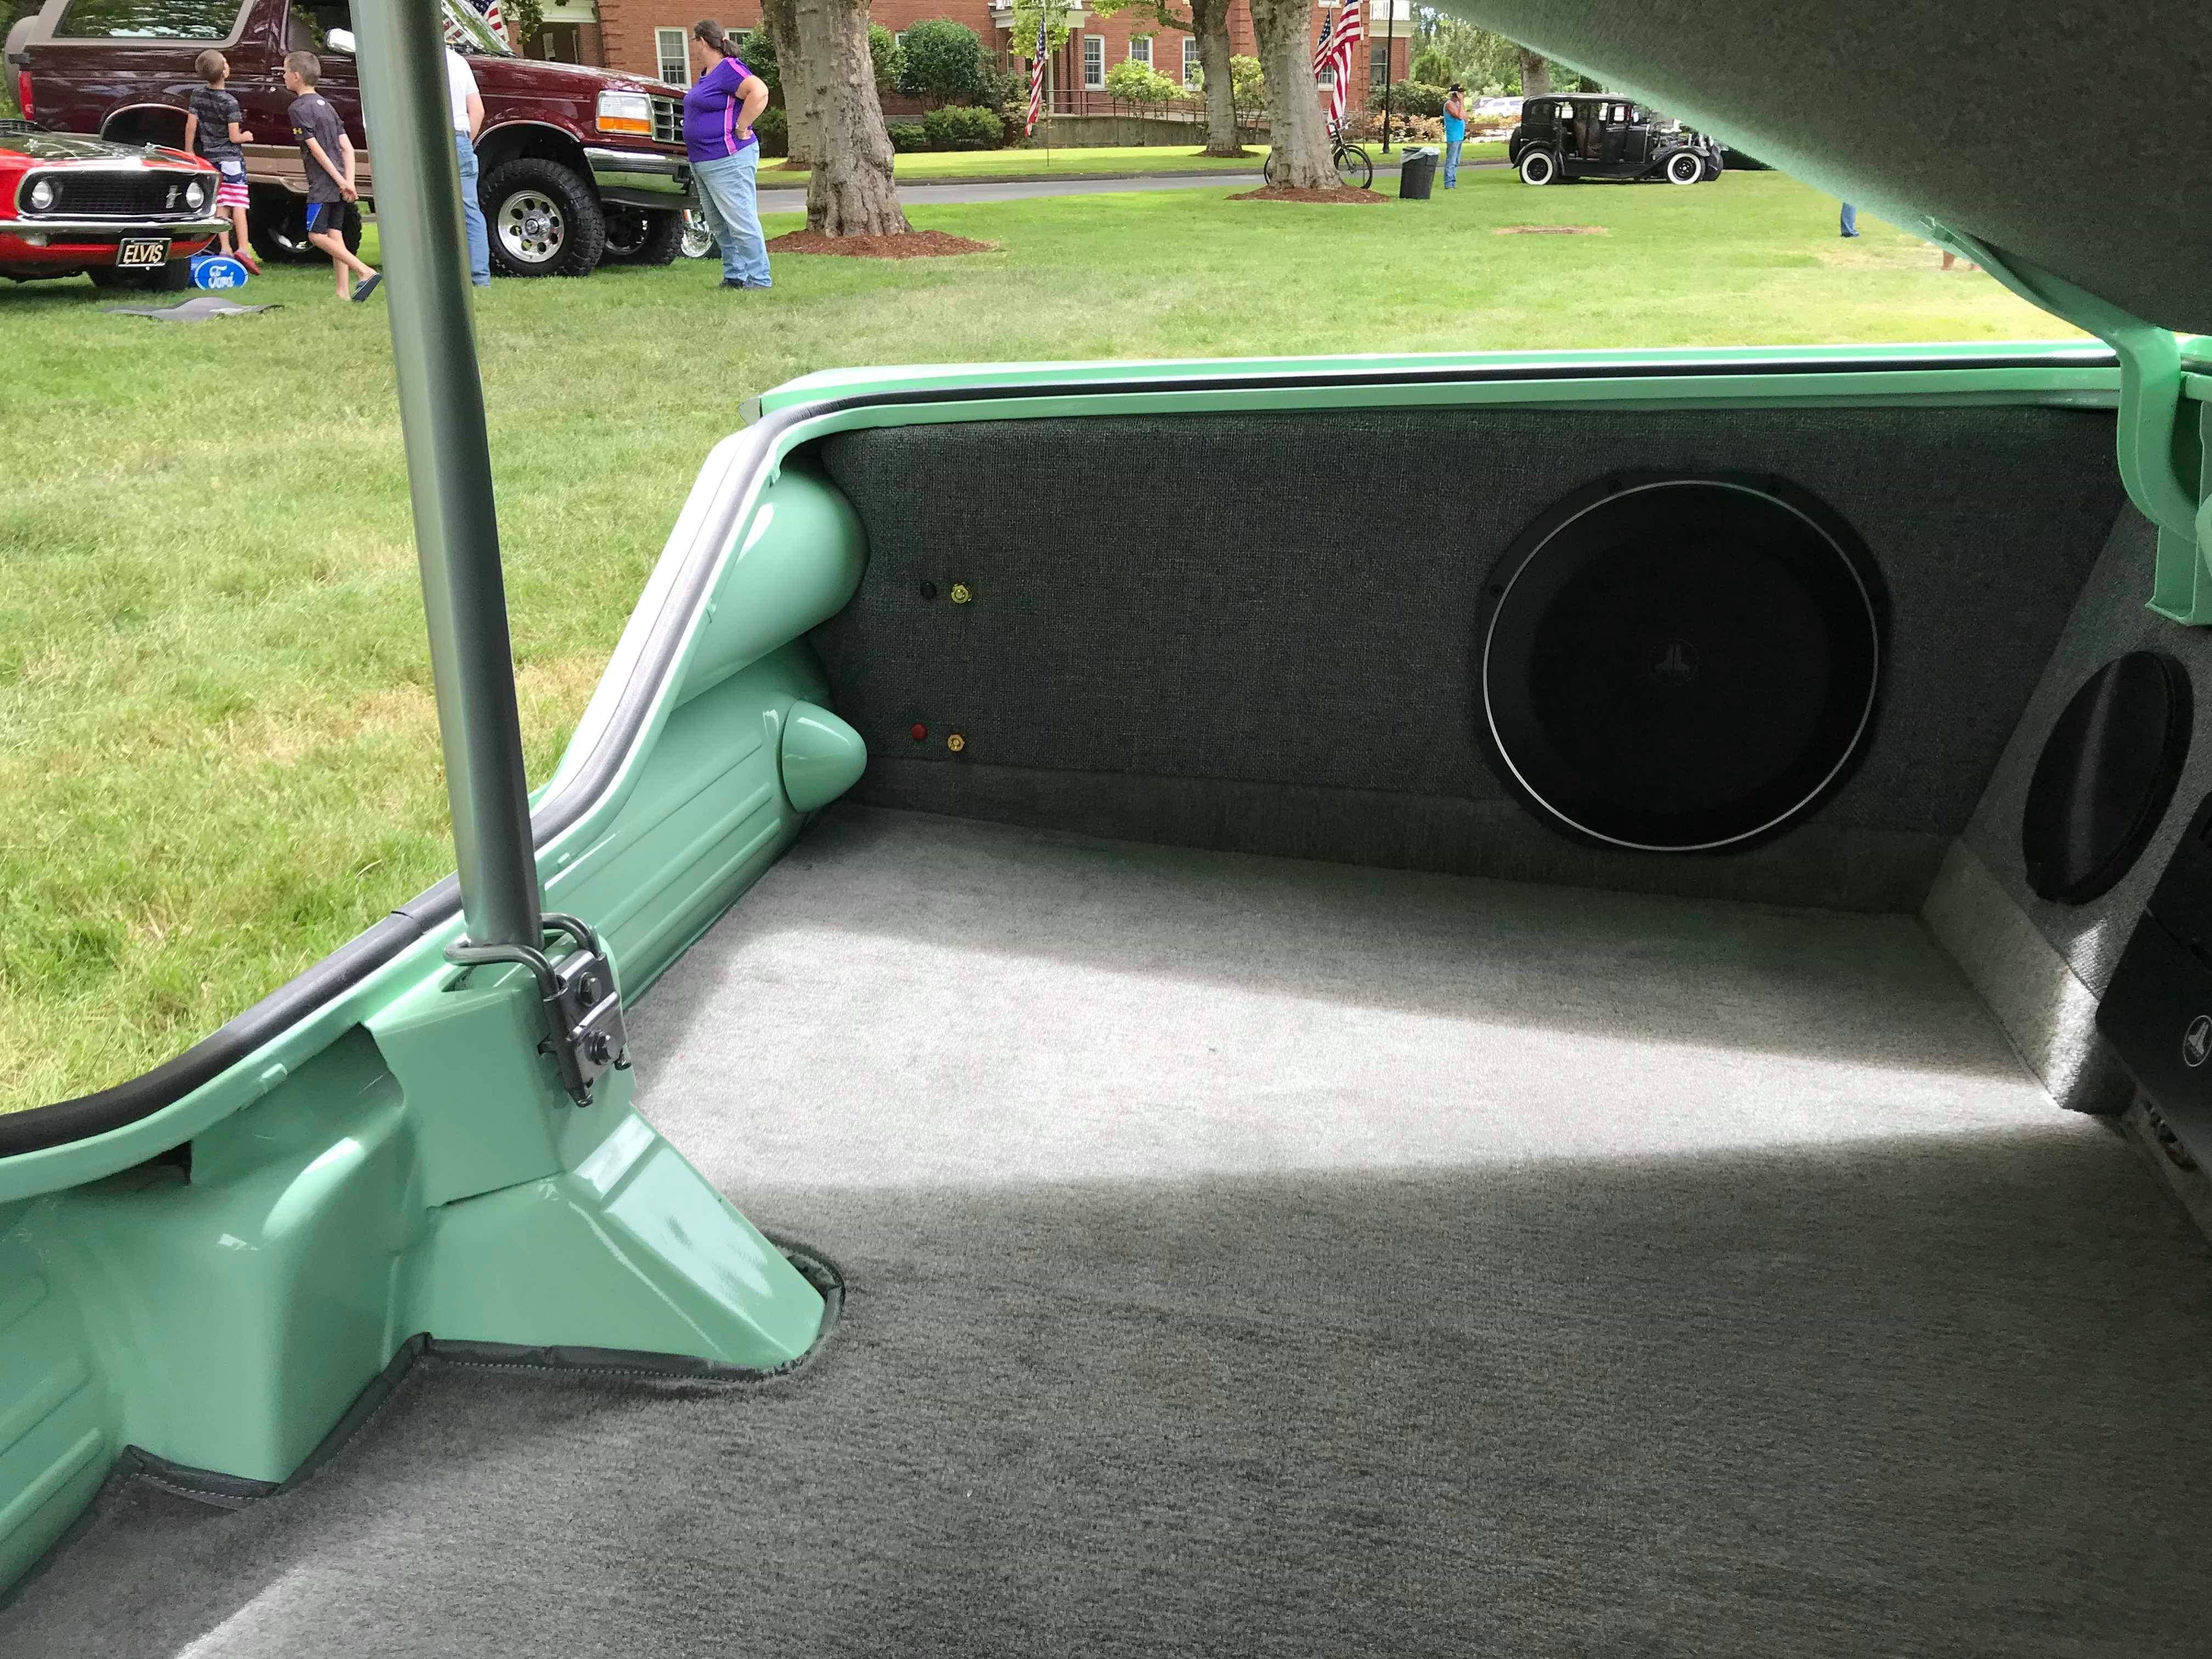 1960 Chevrolet Biscayne Green